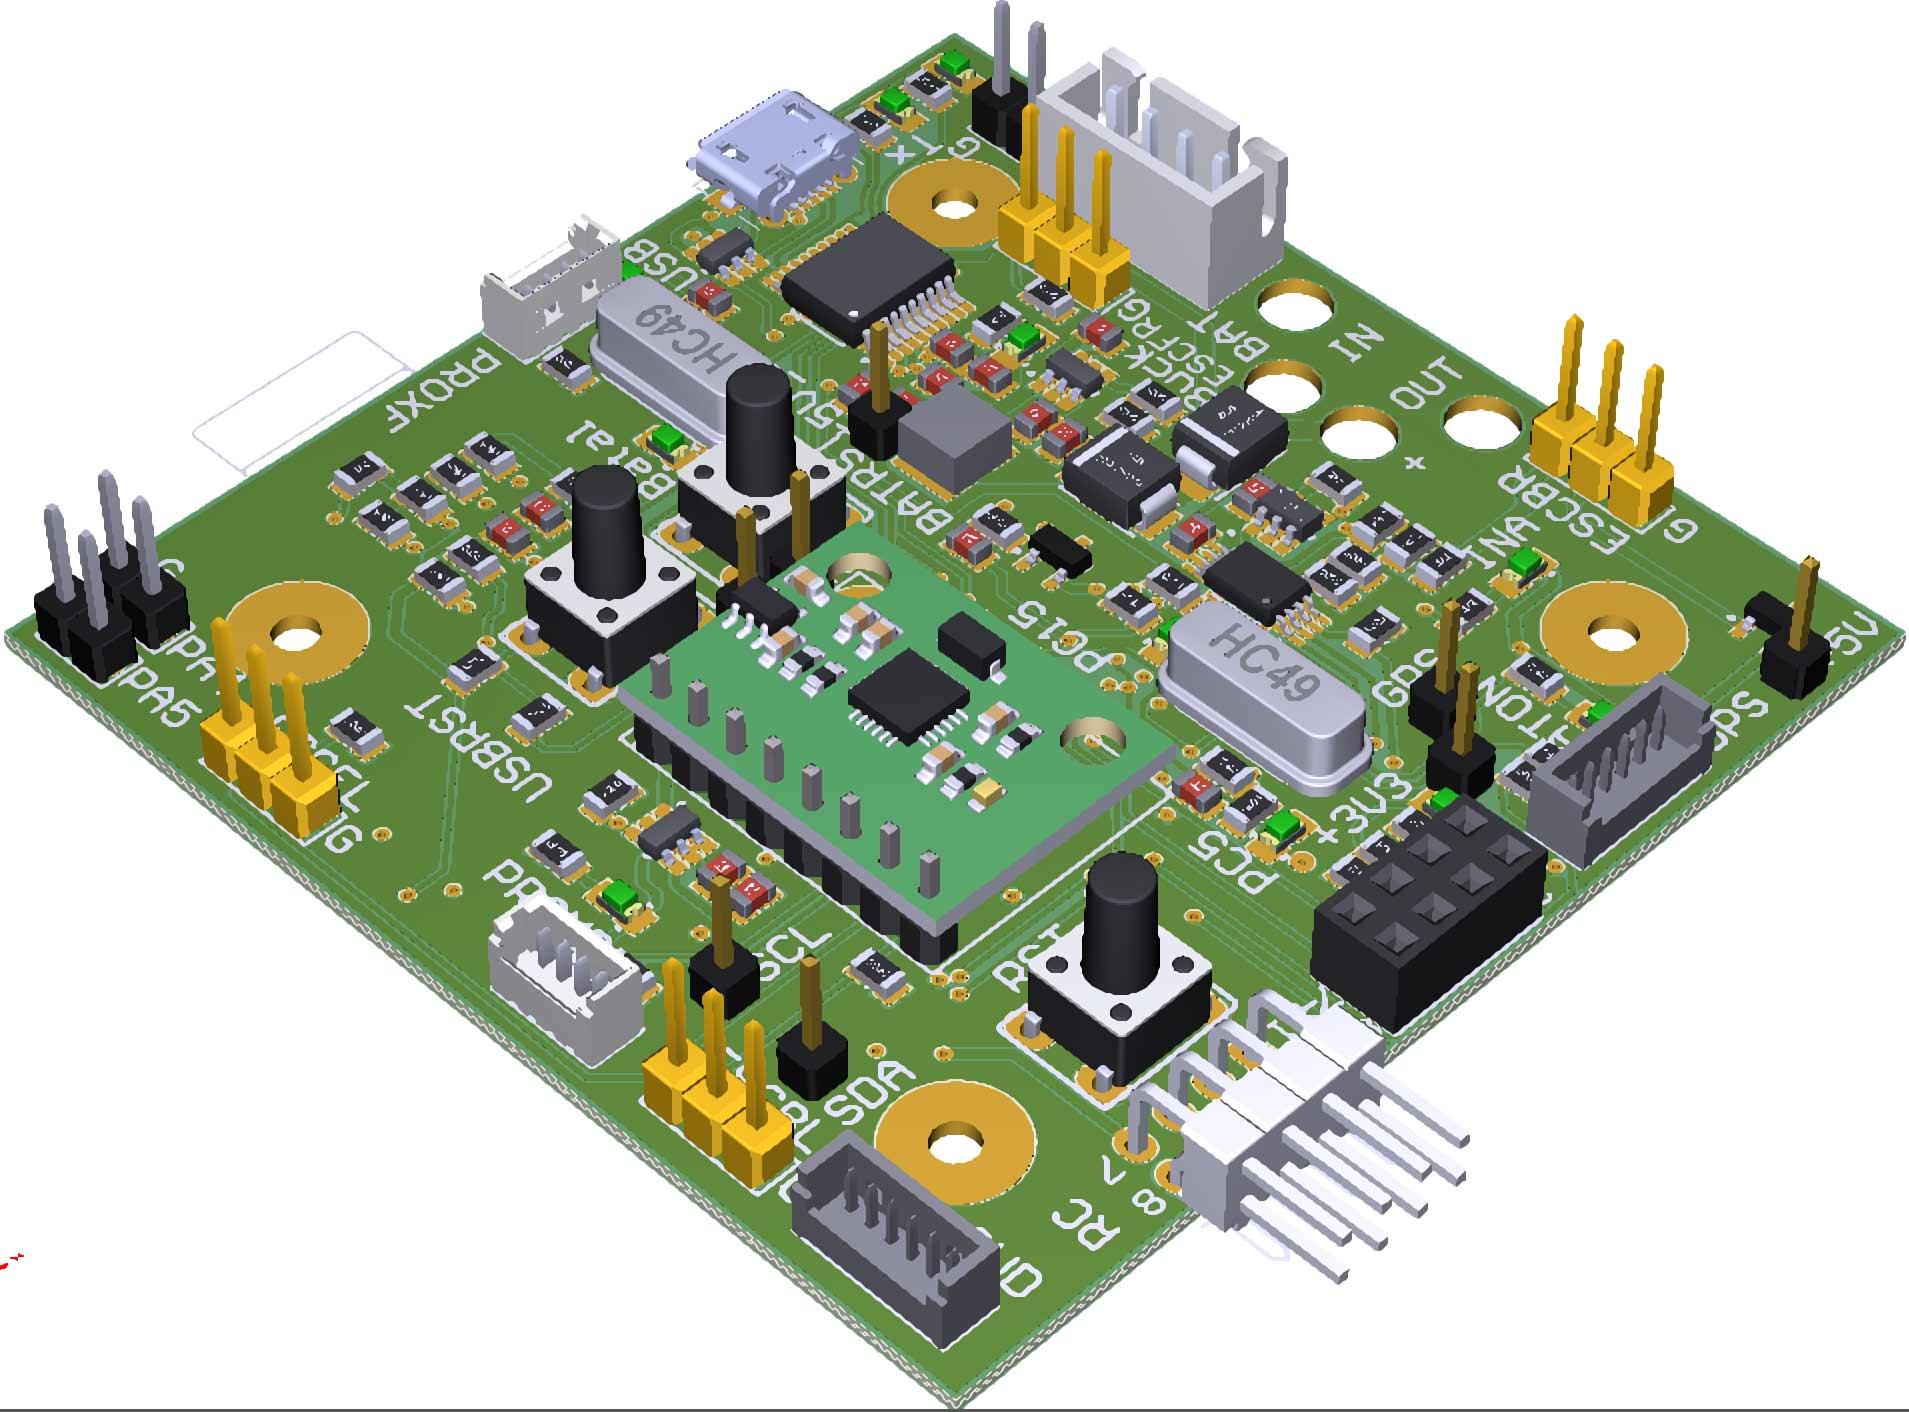 Quadcopter controller board